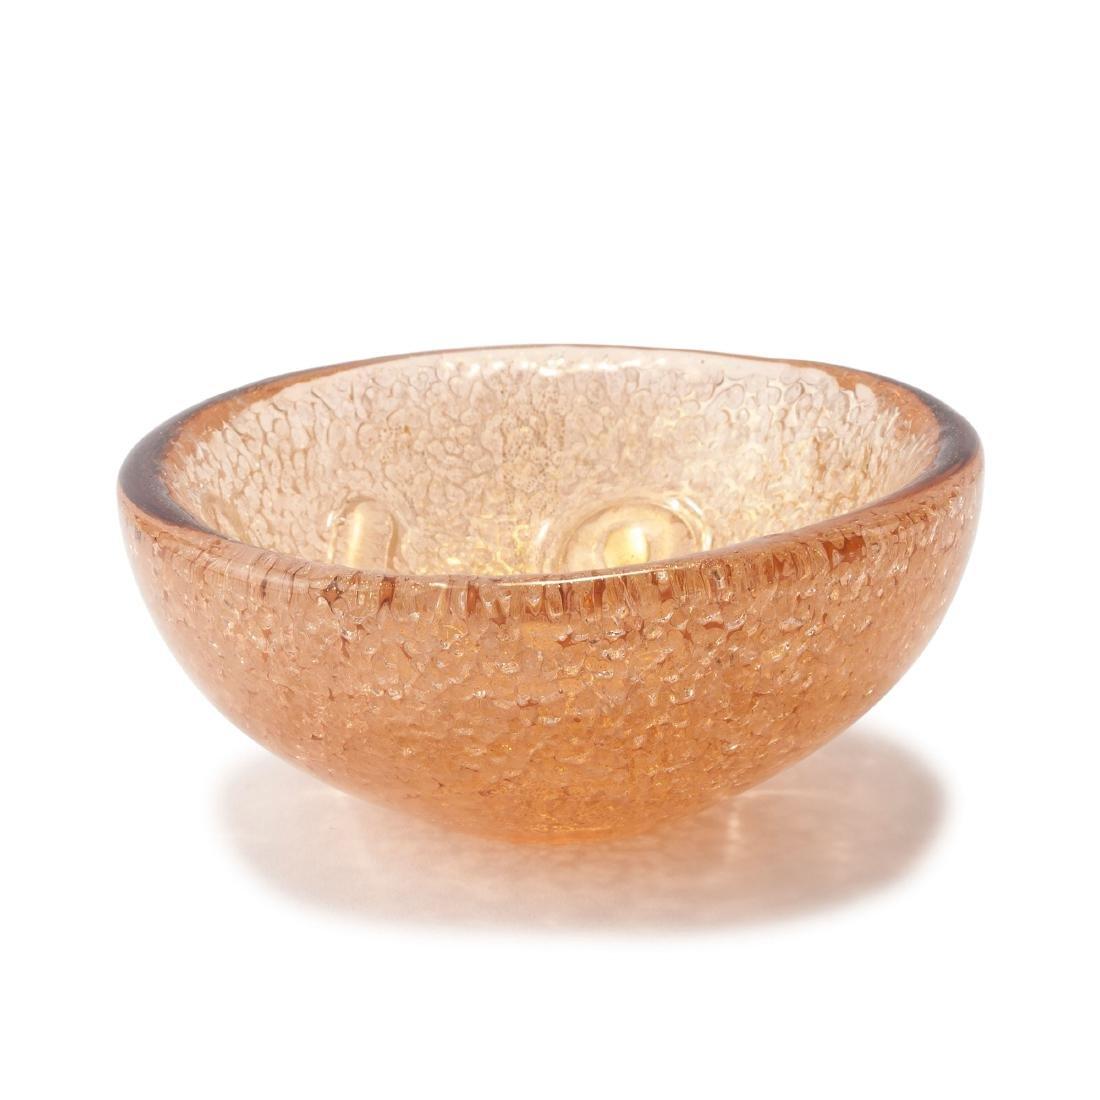 'Rilievi aurati' bowl, 1940